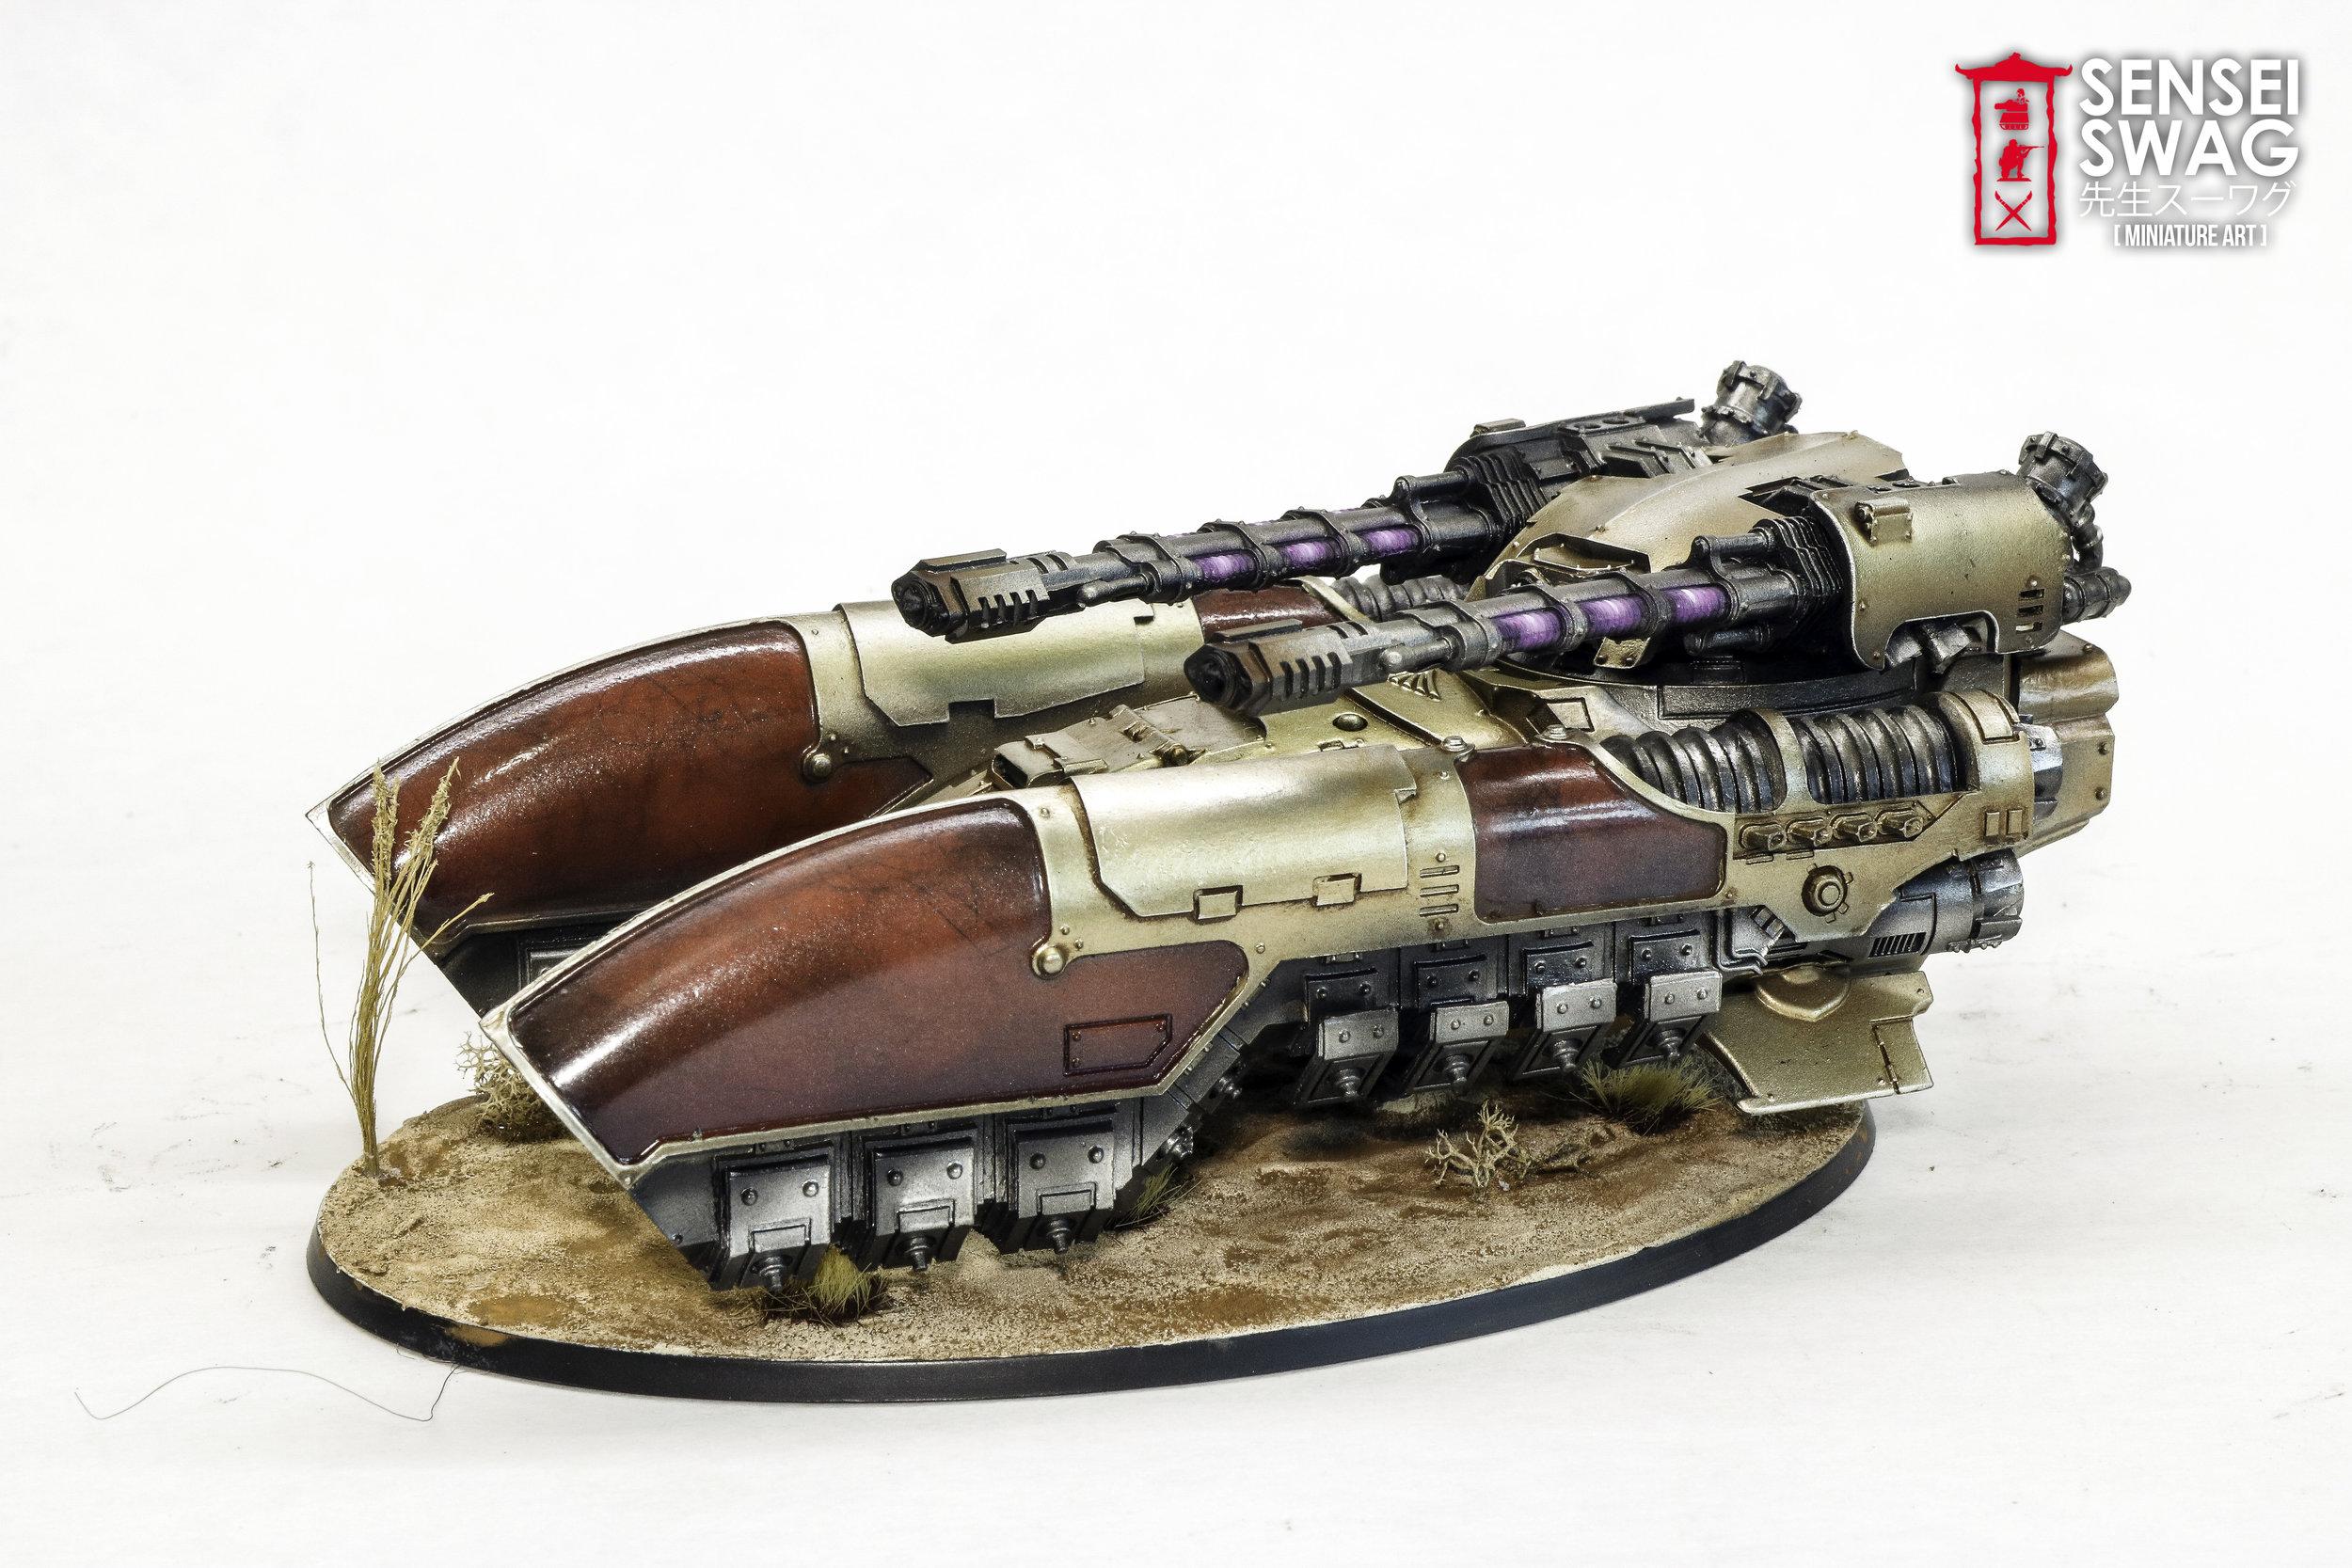 Adeptus Custodes Caladius Grav Tank Marble-4.jpg